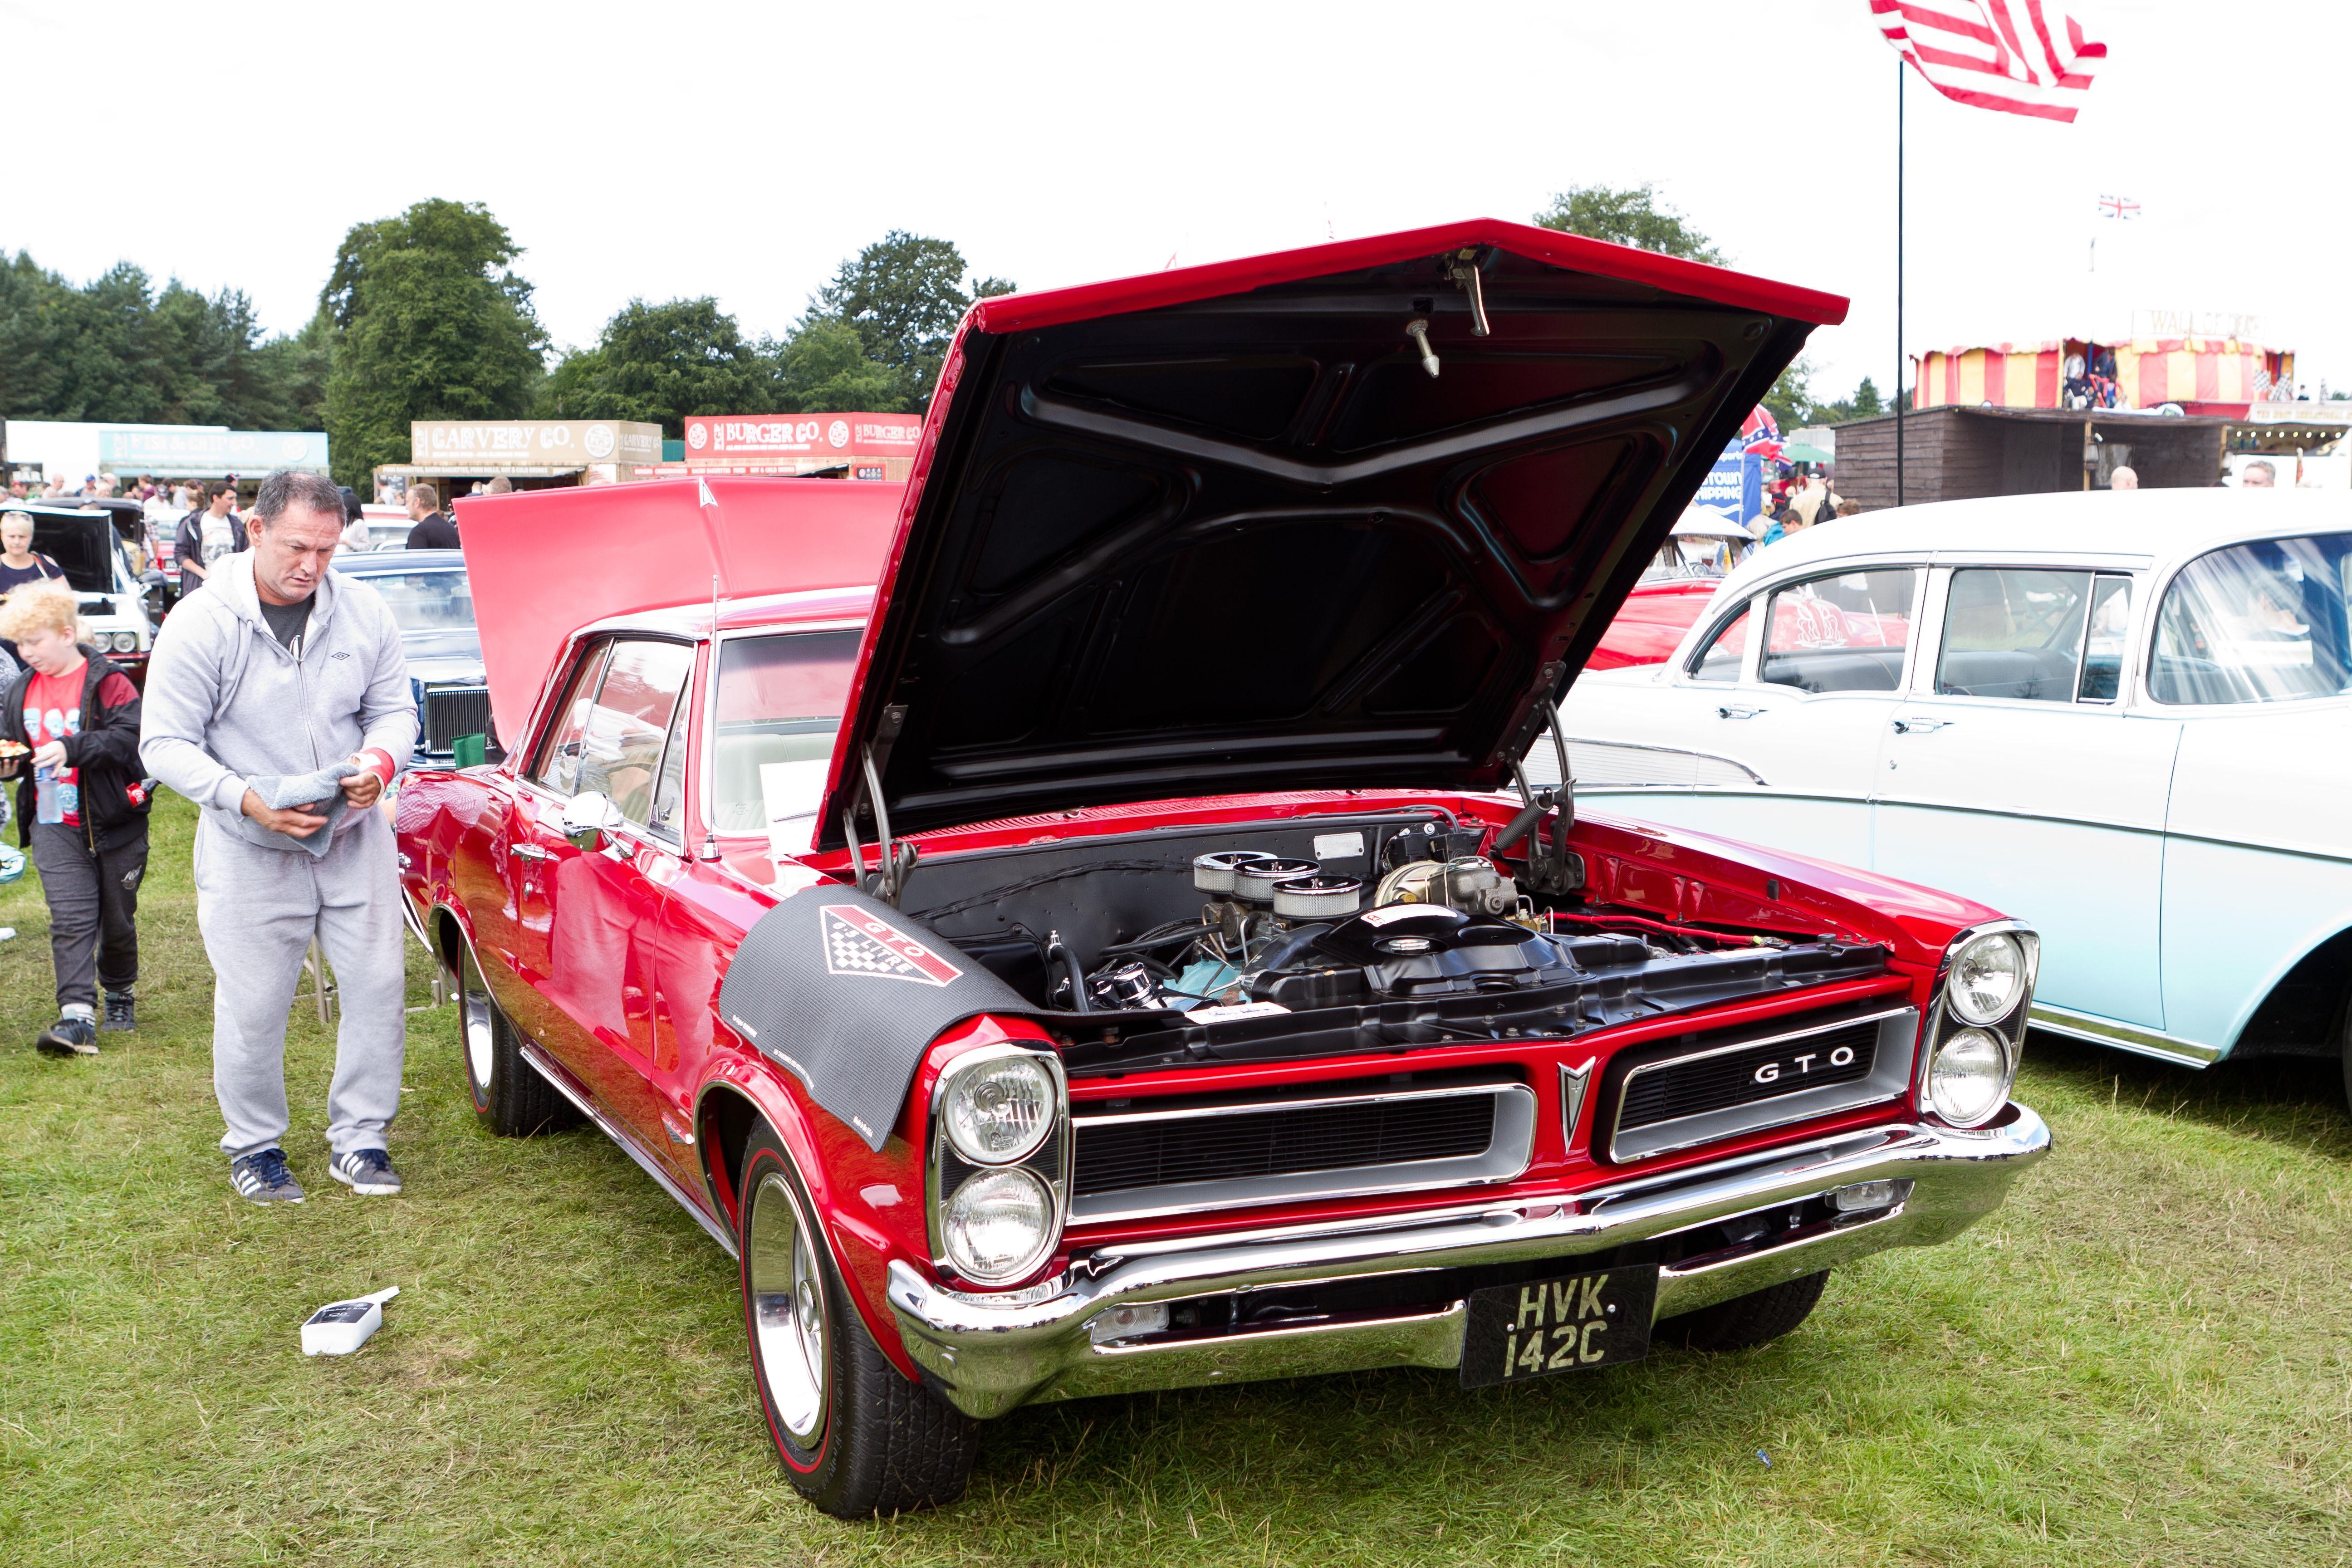 images gratuites v hicule moteur voiture ancienne voiture de muscle sedan voiture. Black Bedroom Furniture Sets. Home Design Ideas